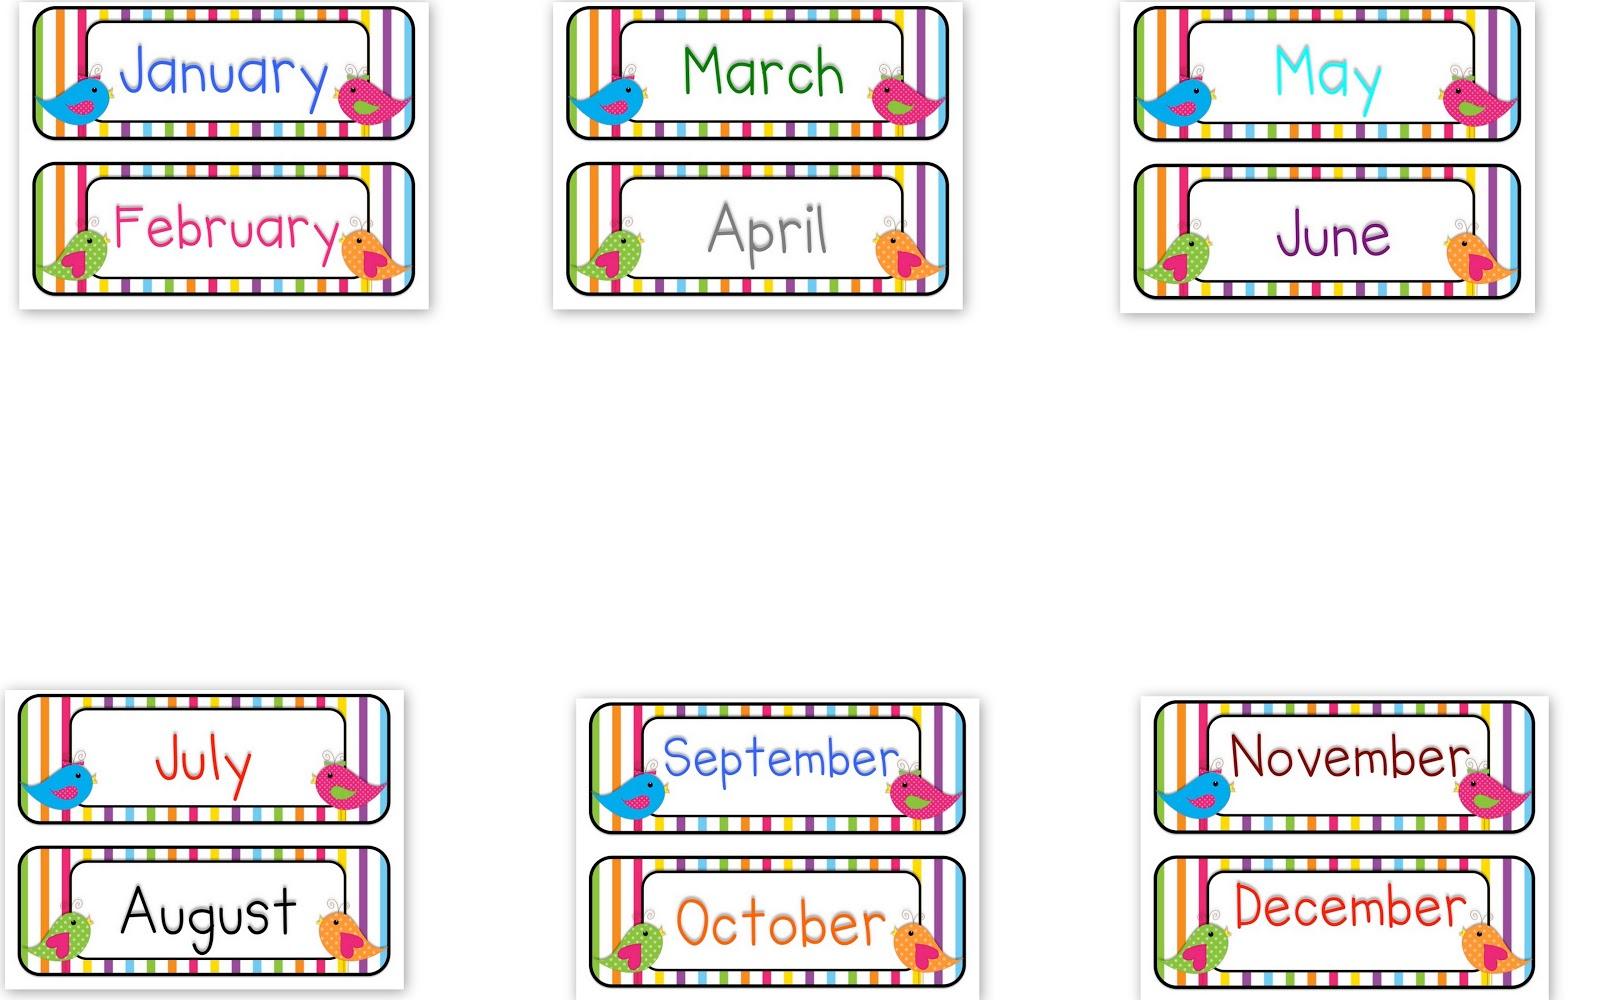 Months of Year Clip Art